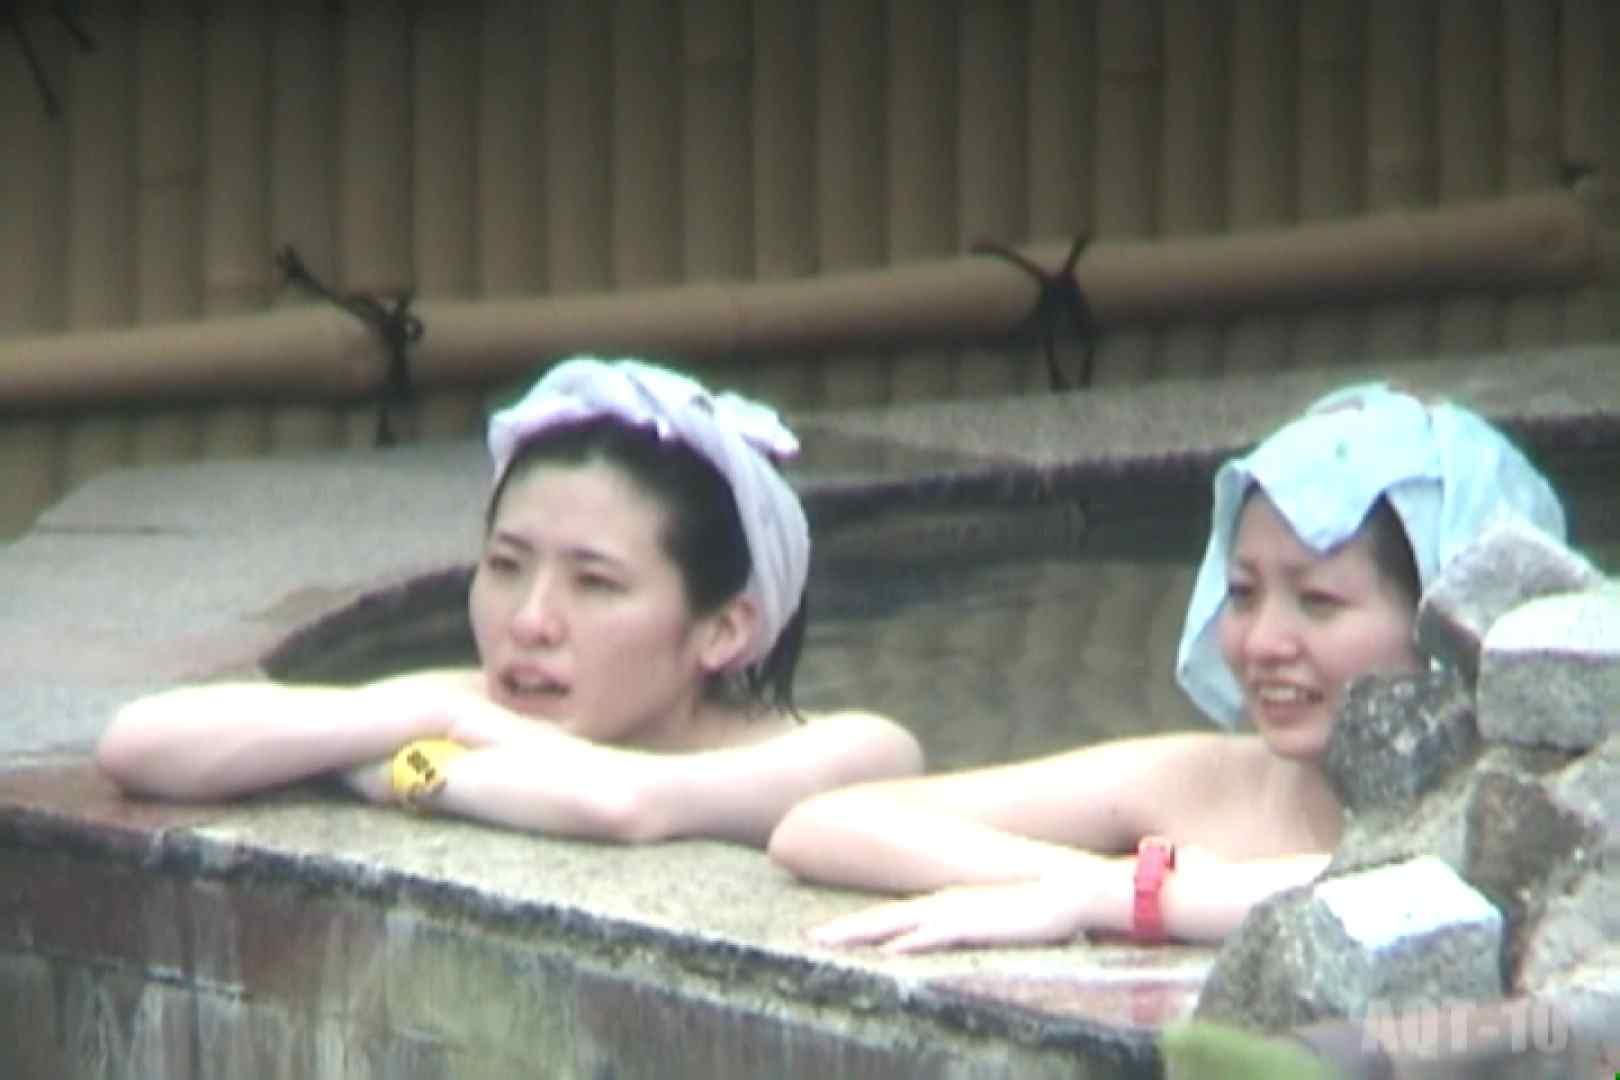 Aquaな露天風呂Vol.793 露天 | OLセックス  94画像 37